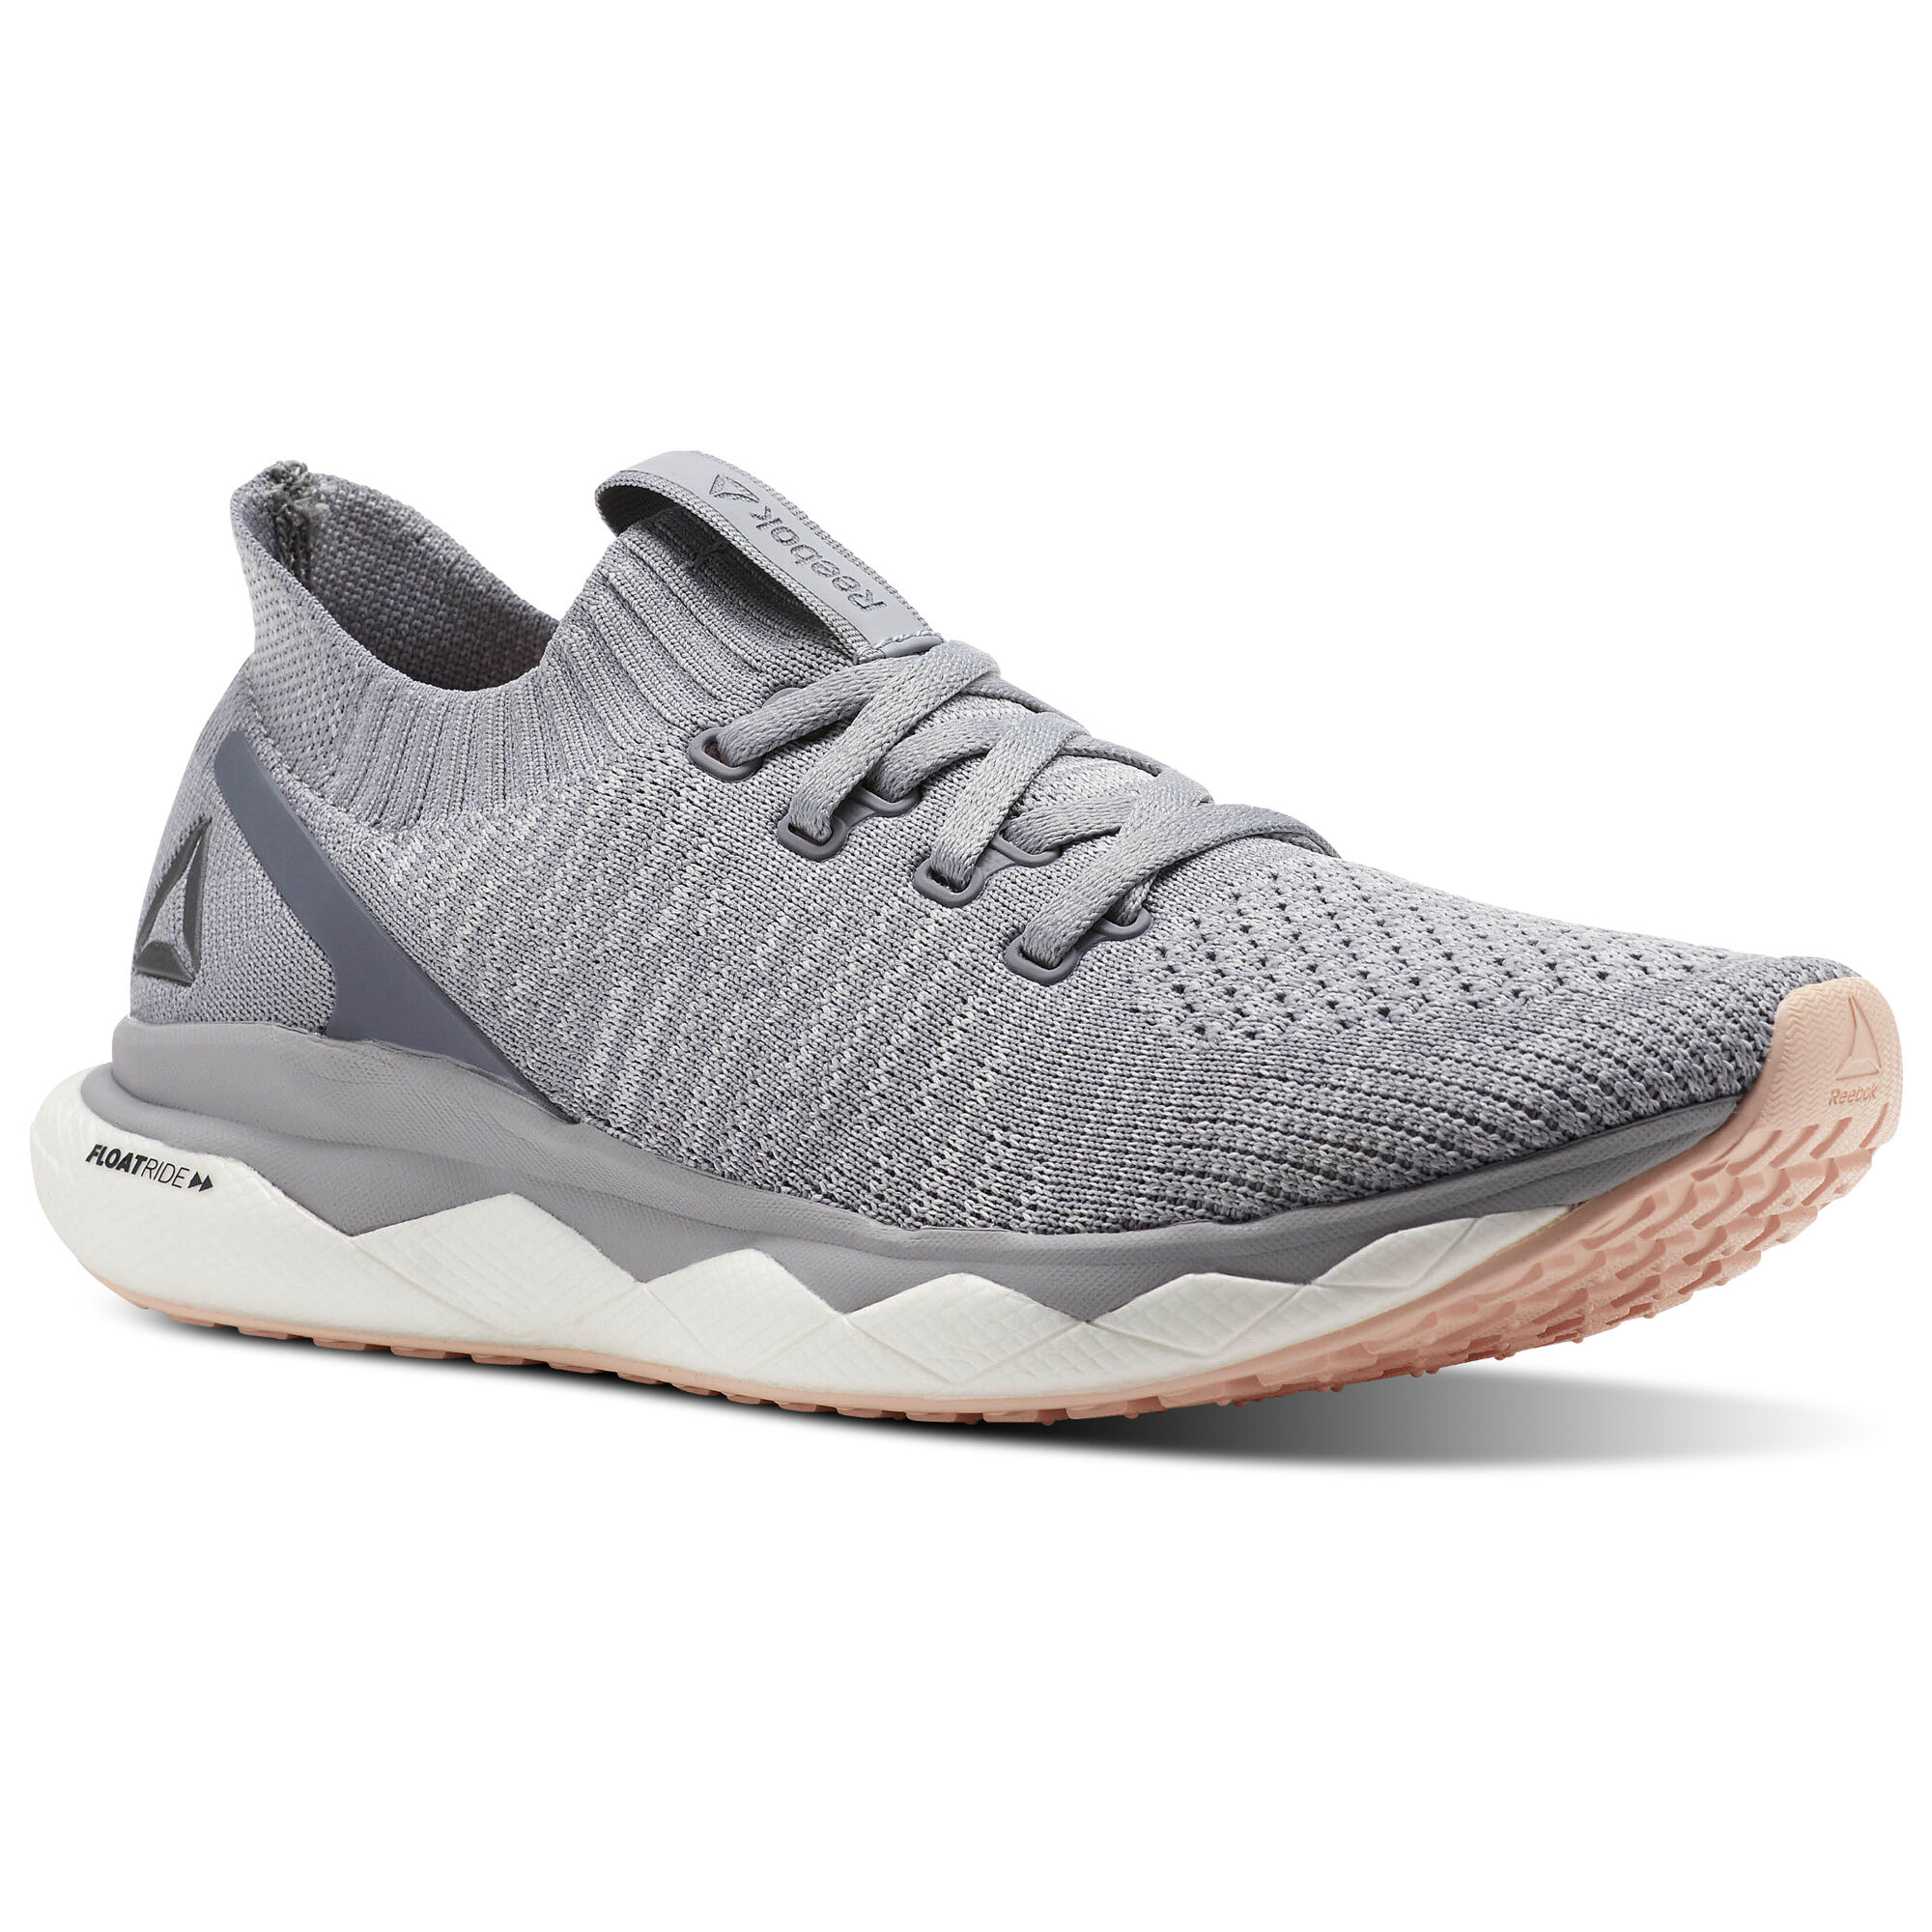 Reebok FLOATRIDE RUN 6000 - Stabilty running shoes - white/skull grey/stucco 9eOGca7